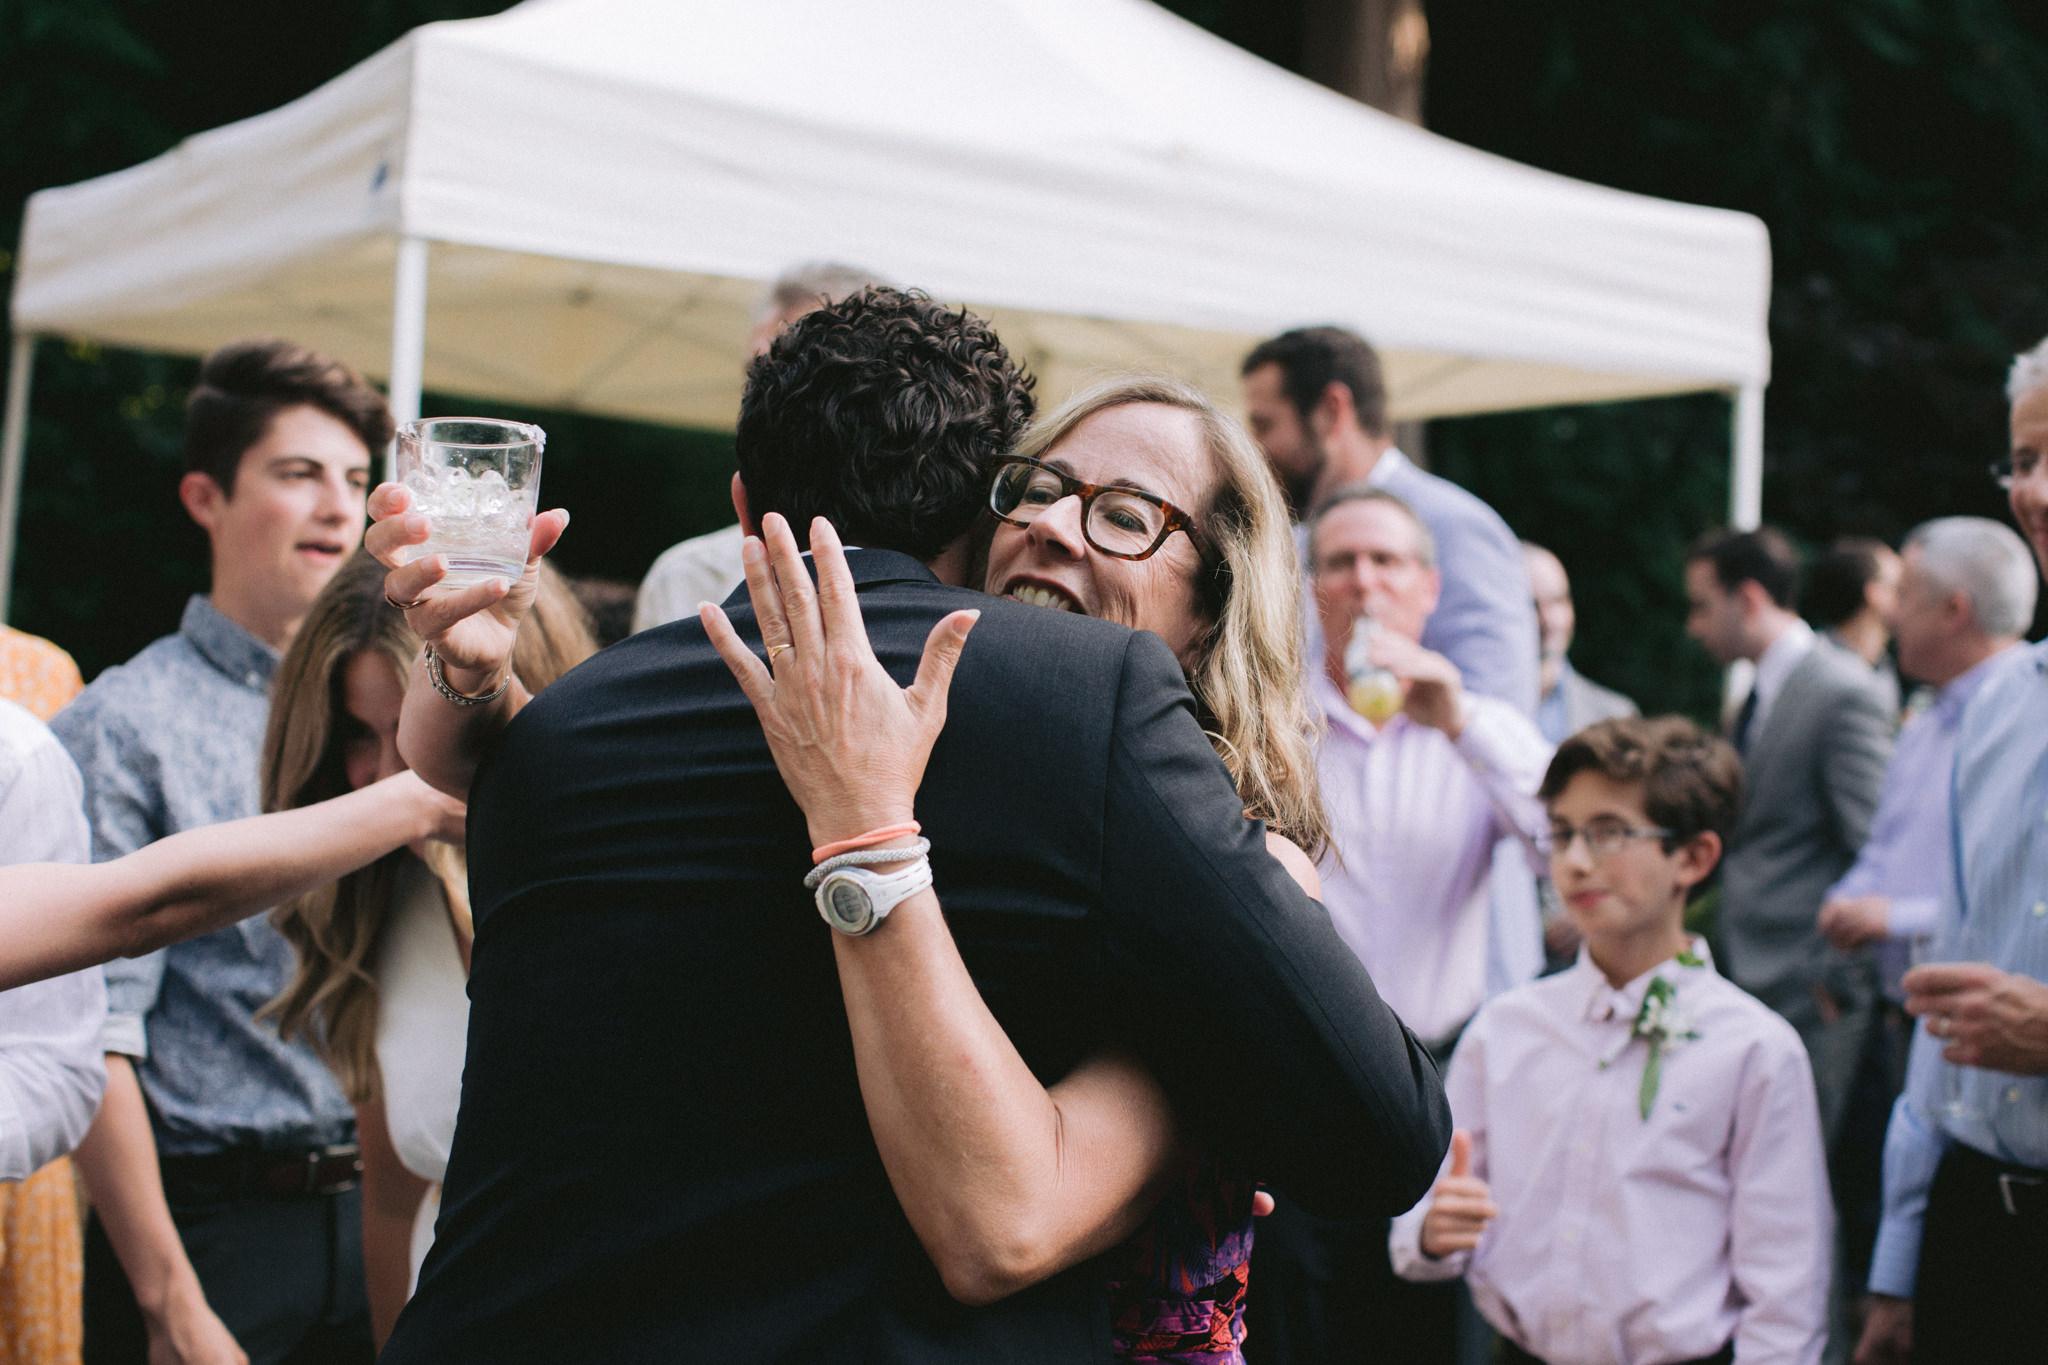 Backyard-Bainbridge-Island-Wedding-Alycia-Lovell-Photography-141.JPG